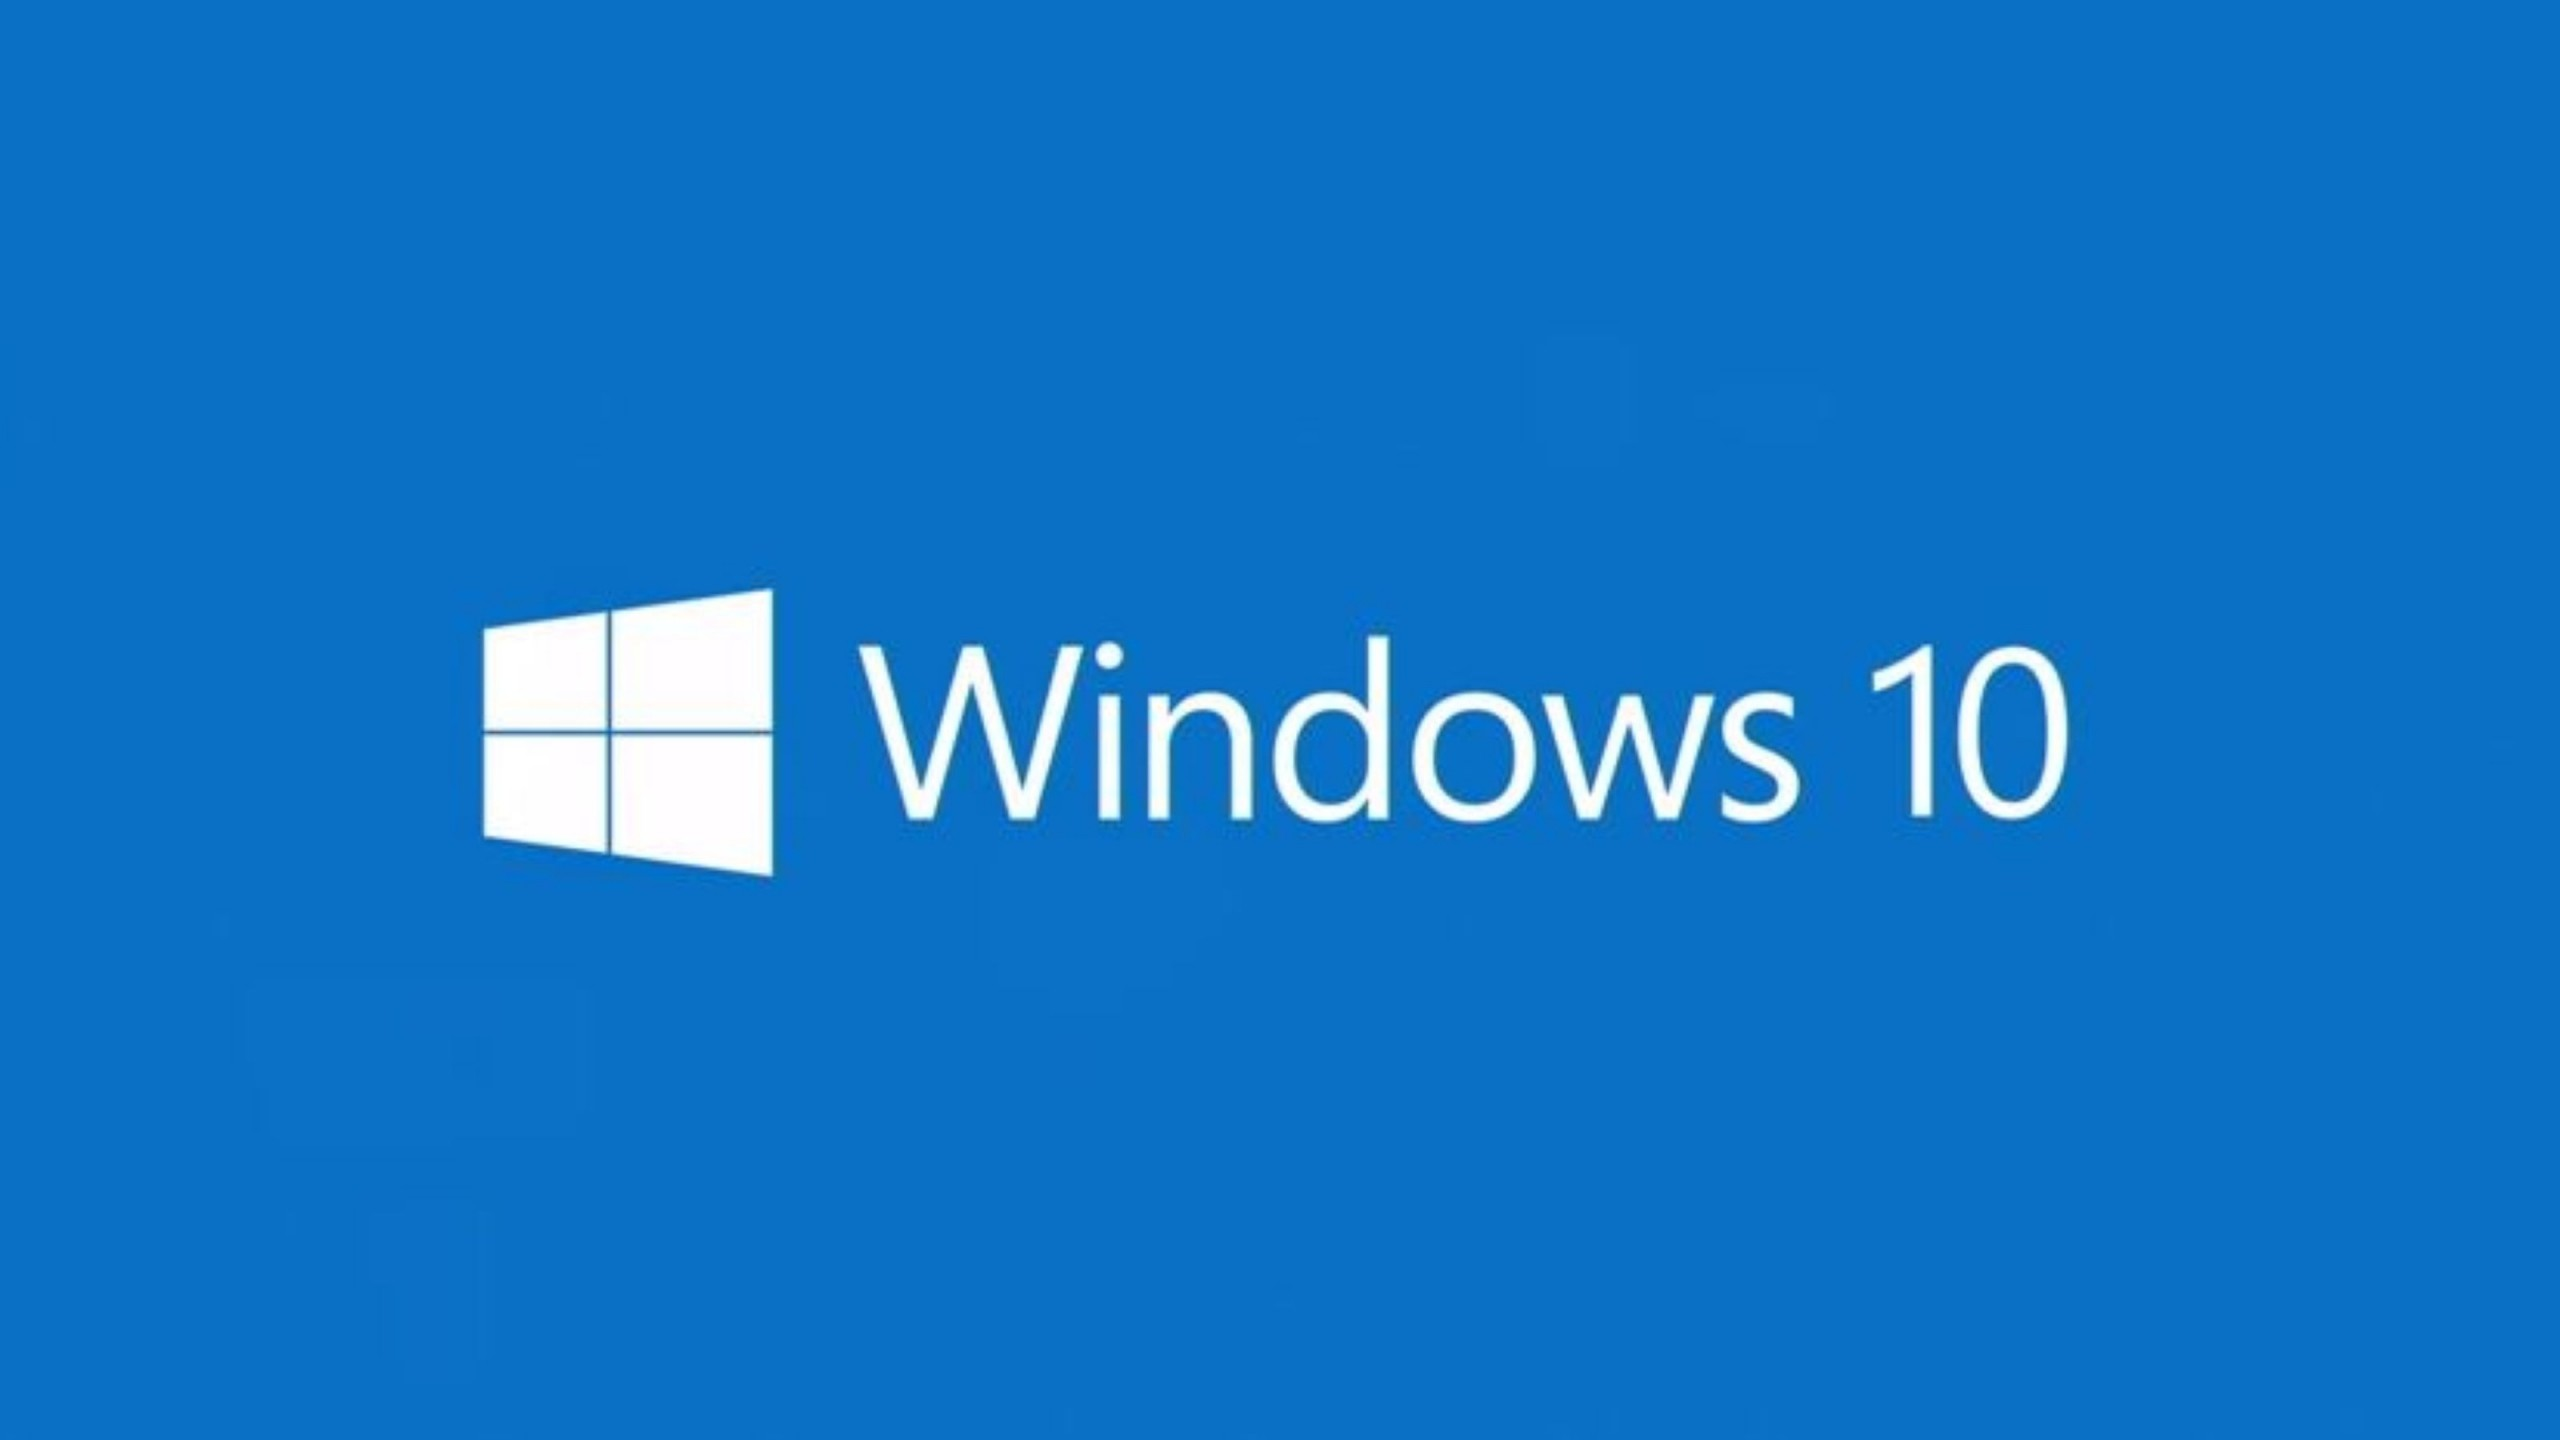 Wallpaper windows 10 technical preview, windows 10 logo, microsoft